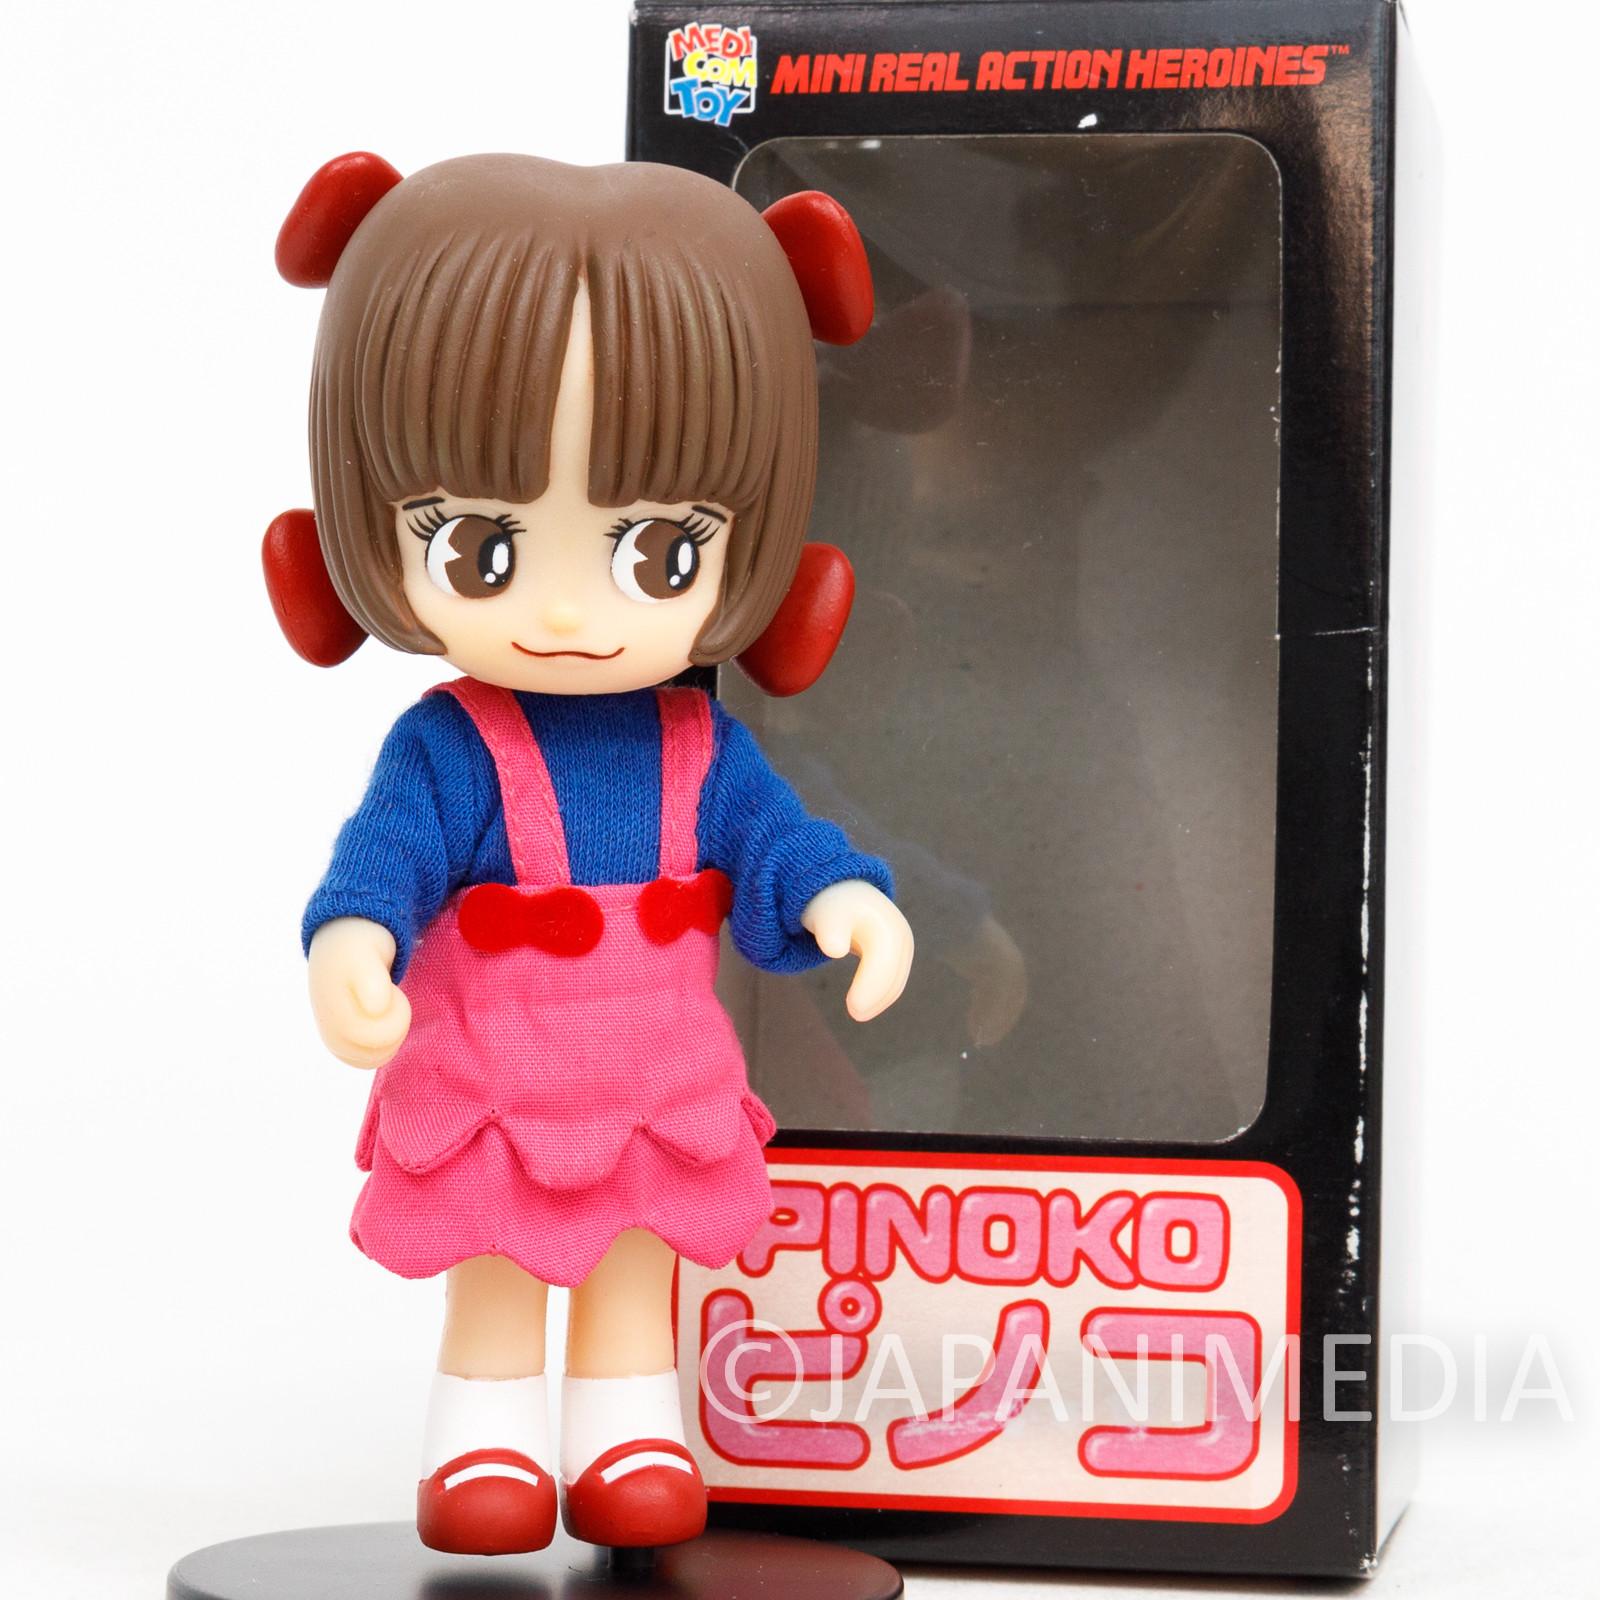 BLACK JACK Pinoko Mini Real Action Heroines Figure Medicom Toy JAPAN ANIME